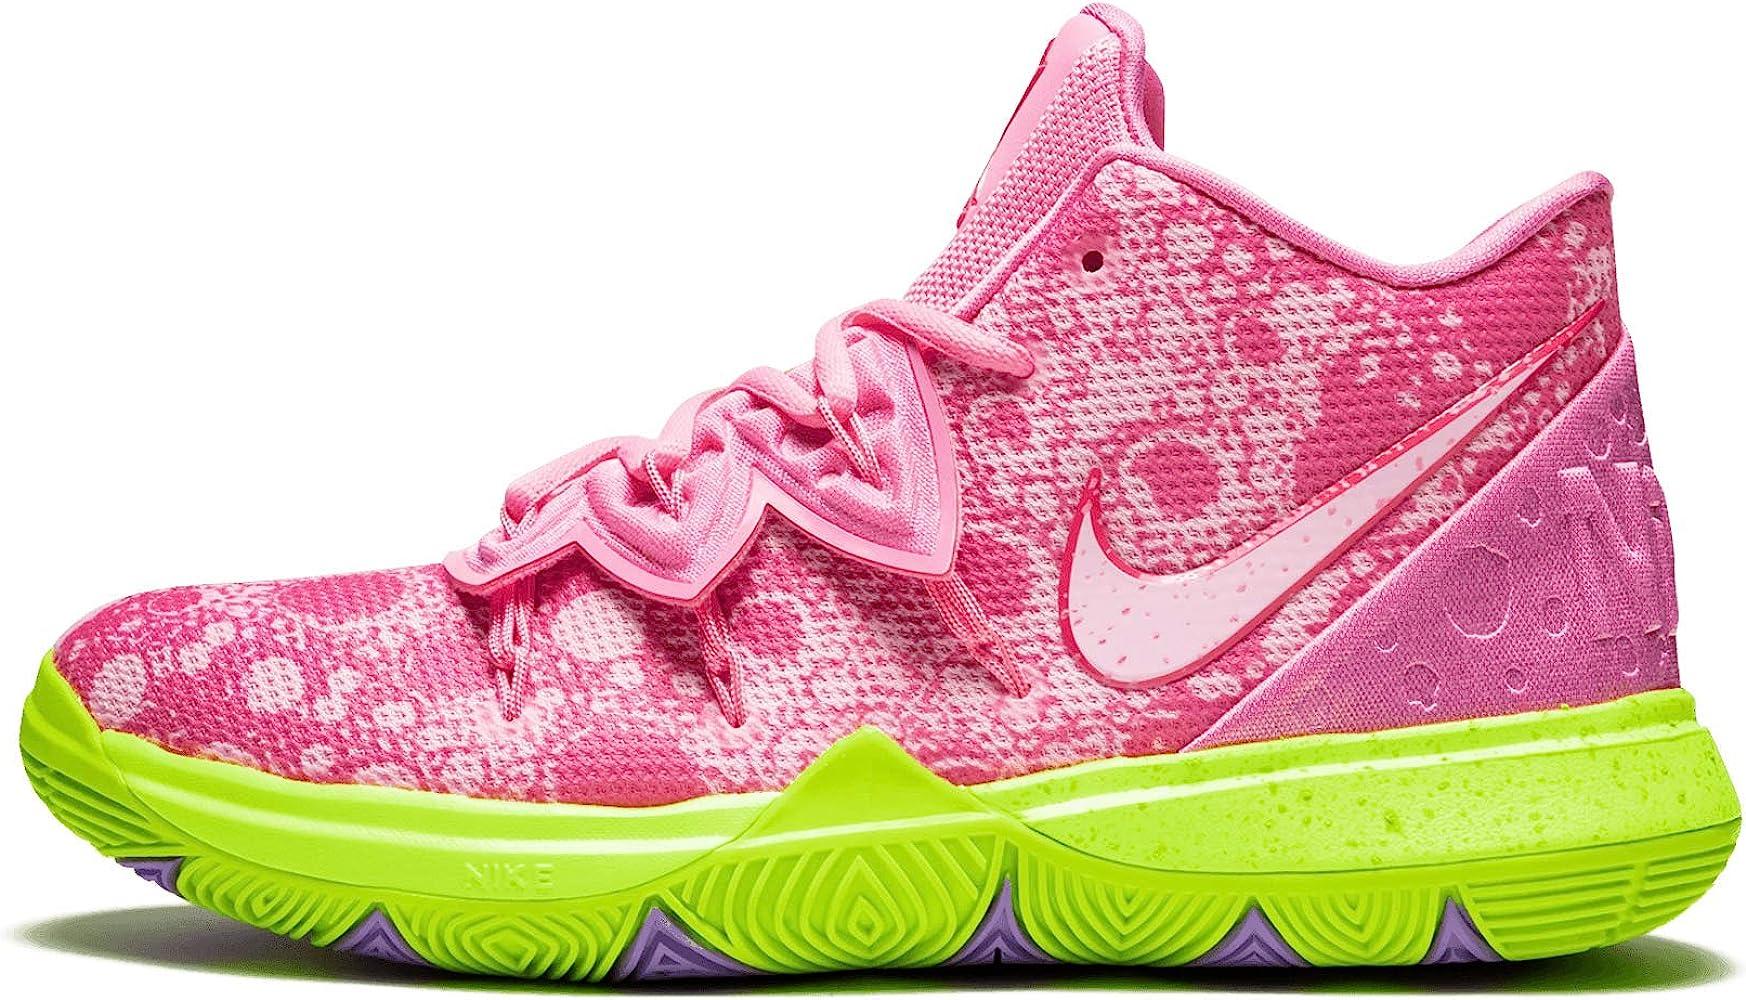 Amazon.com: Nike Kyrie 5 Sbsp (Lotus